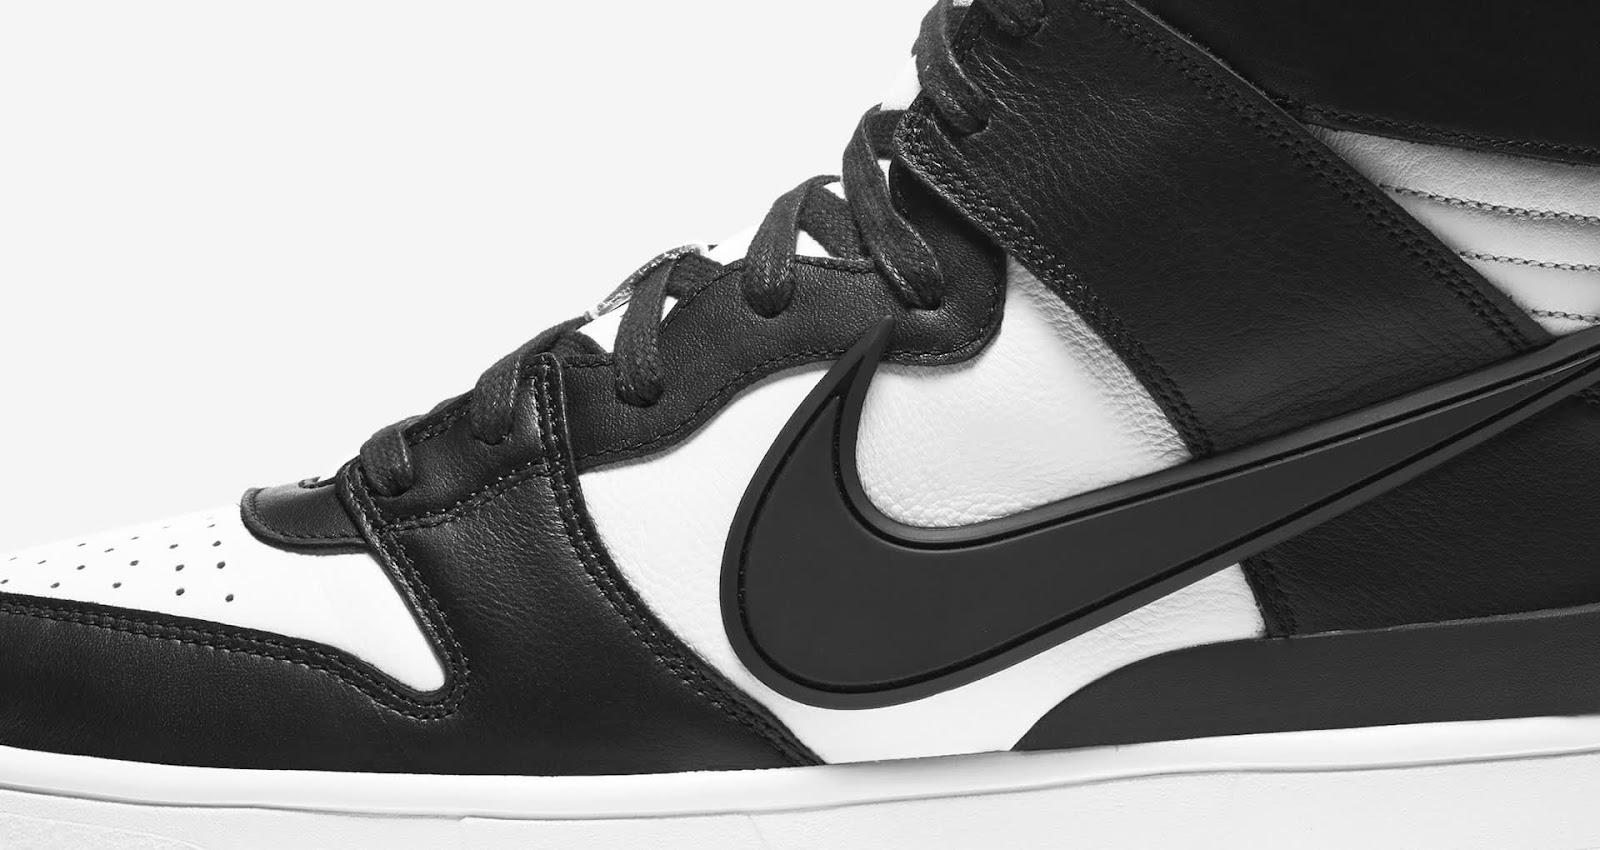 Nike Dunk High X AMBUSH รองเท้าที่ทาง Nike Collaboration กับแบรนด์แฟชั่นจากโตเกียว 02